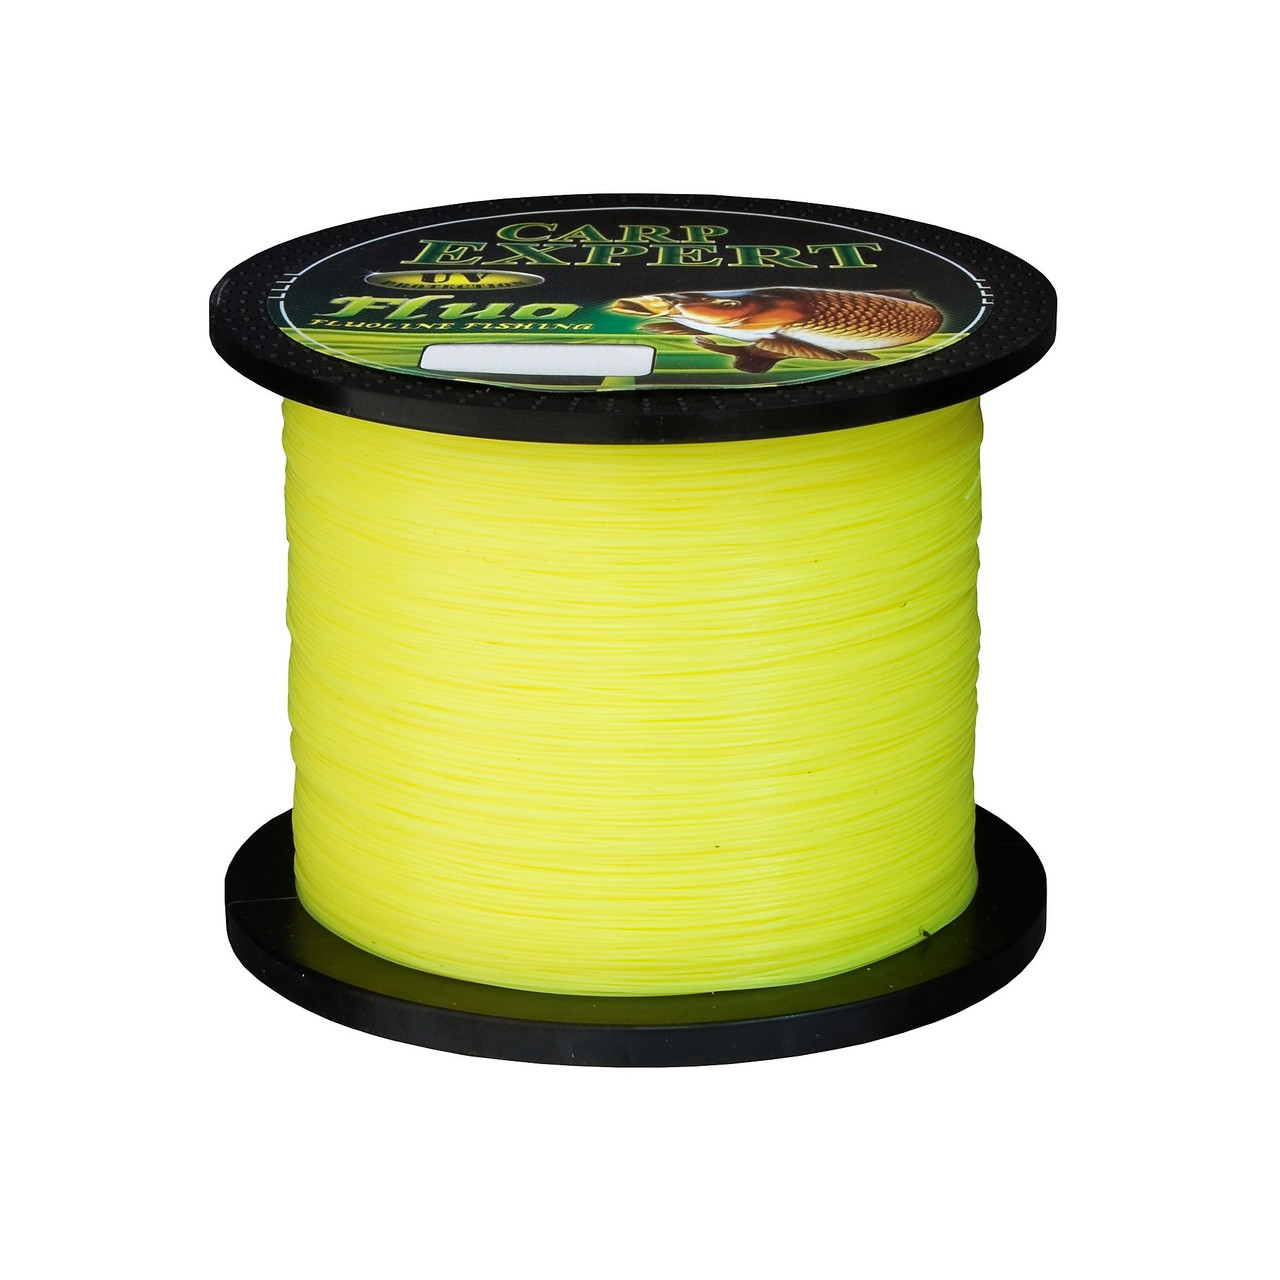 Леска Energofish Carp Expert UV Fluo Yellow 1000 м 0.25 мм 8.9 кг (30120825)